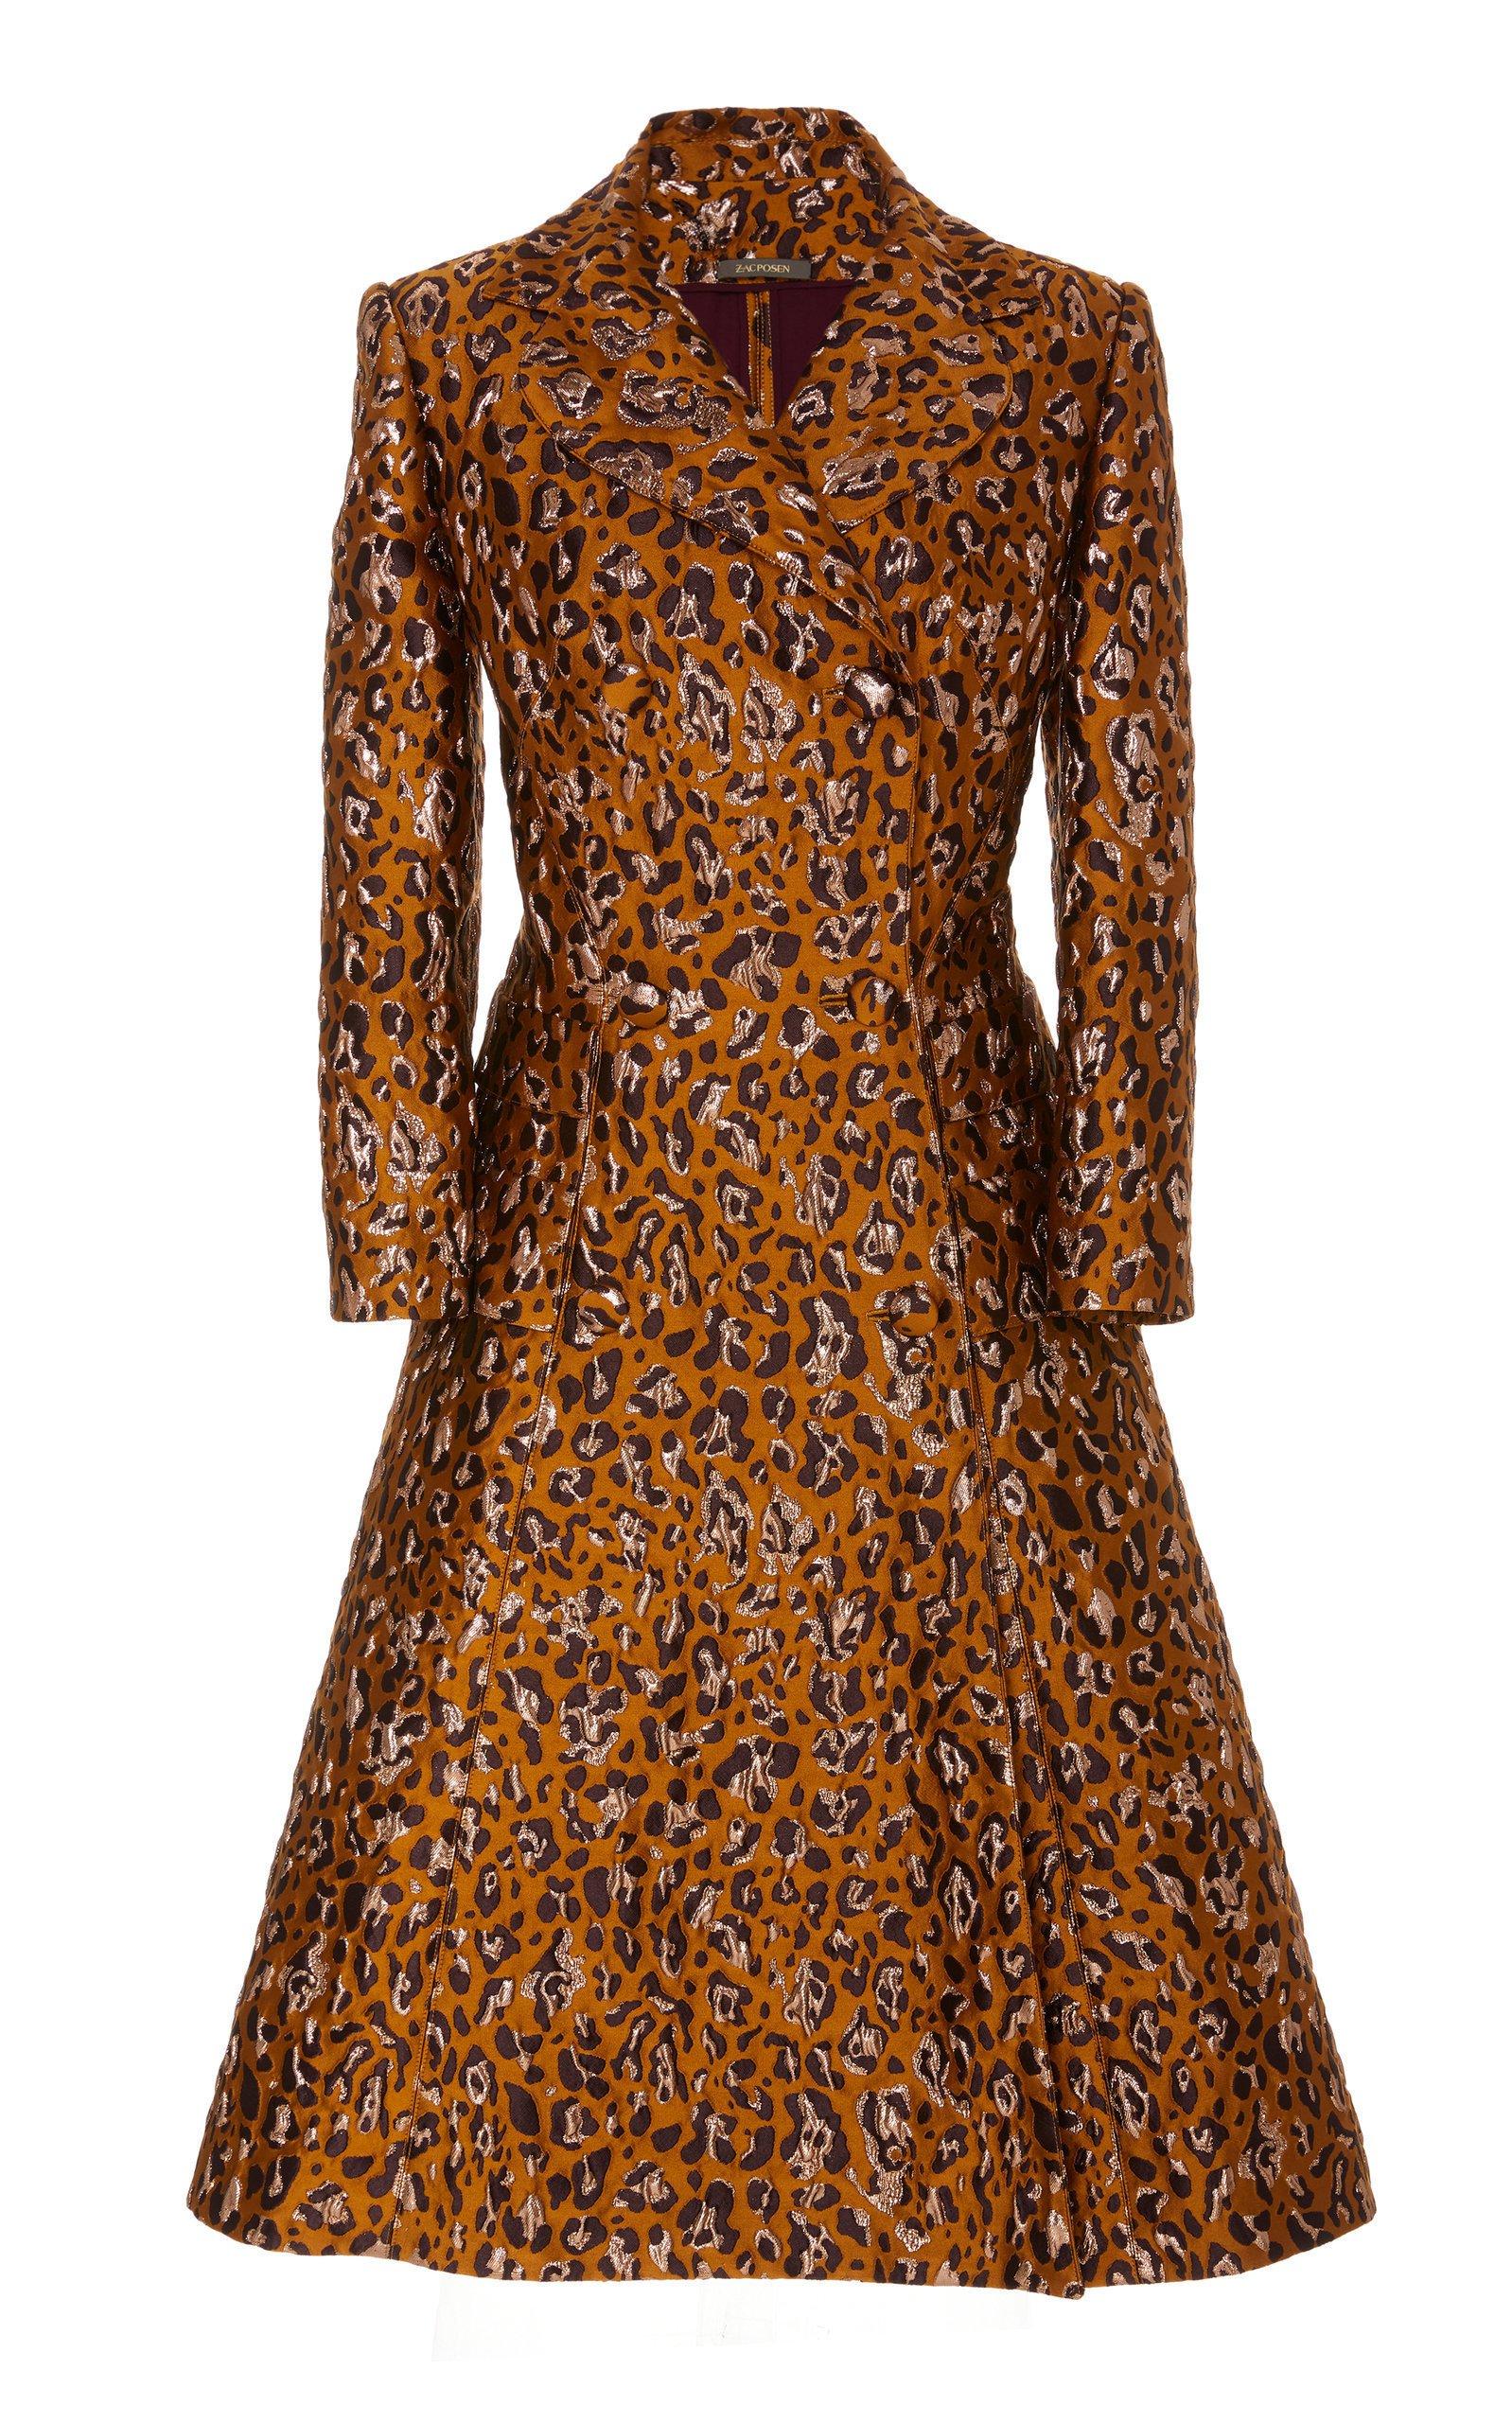 Zac Posen Leopard-Print Jacquard A-Line Coat